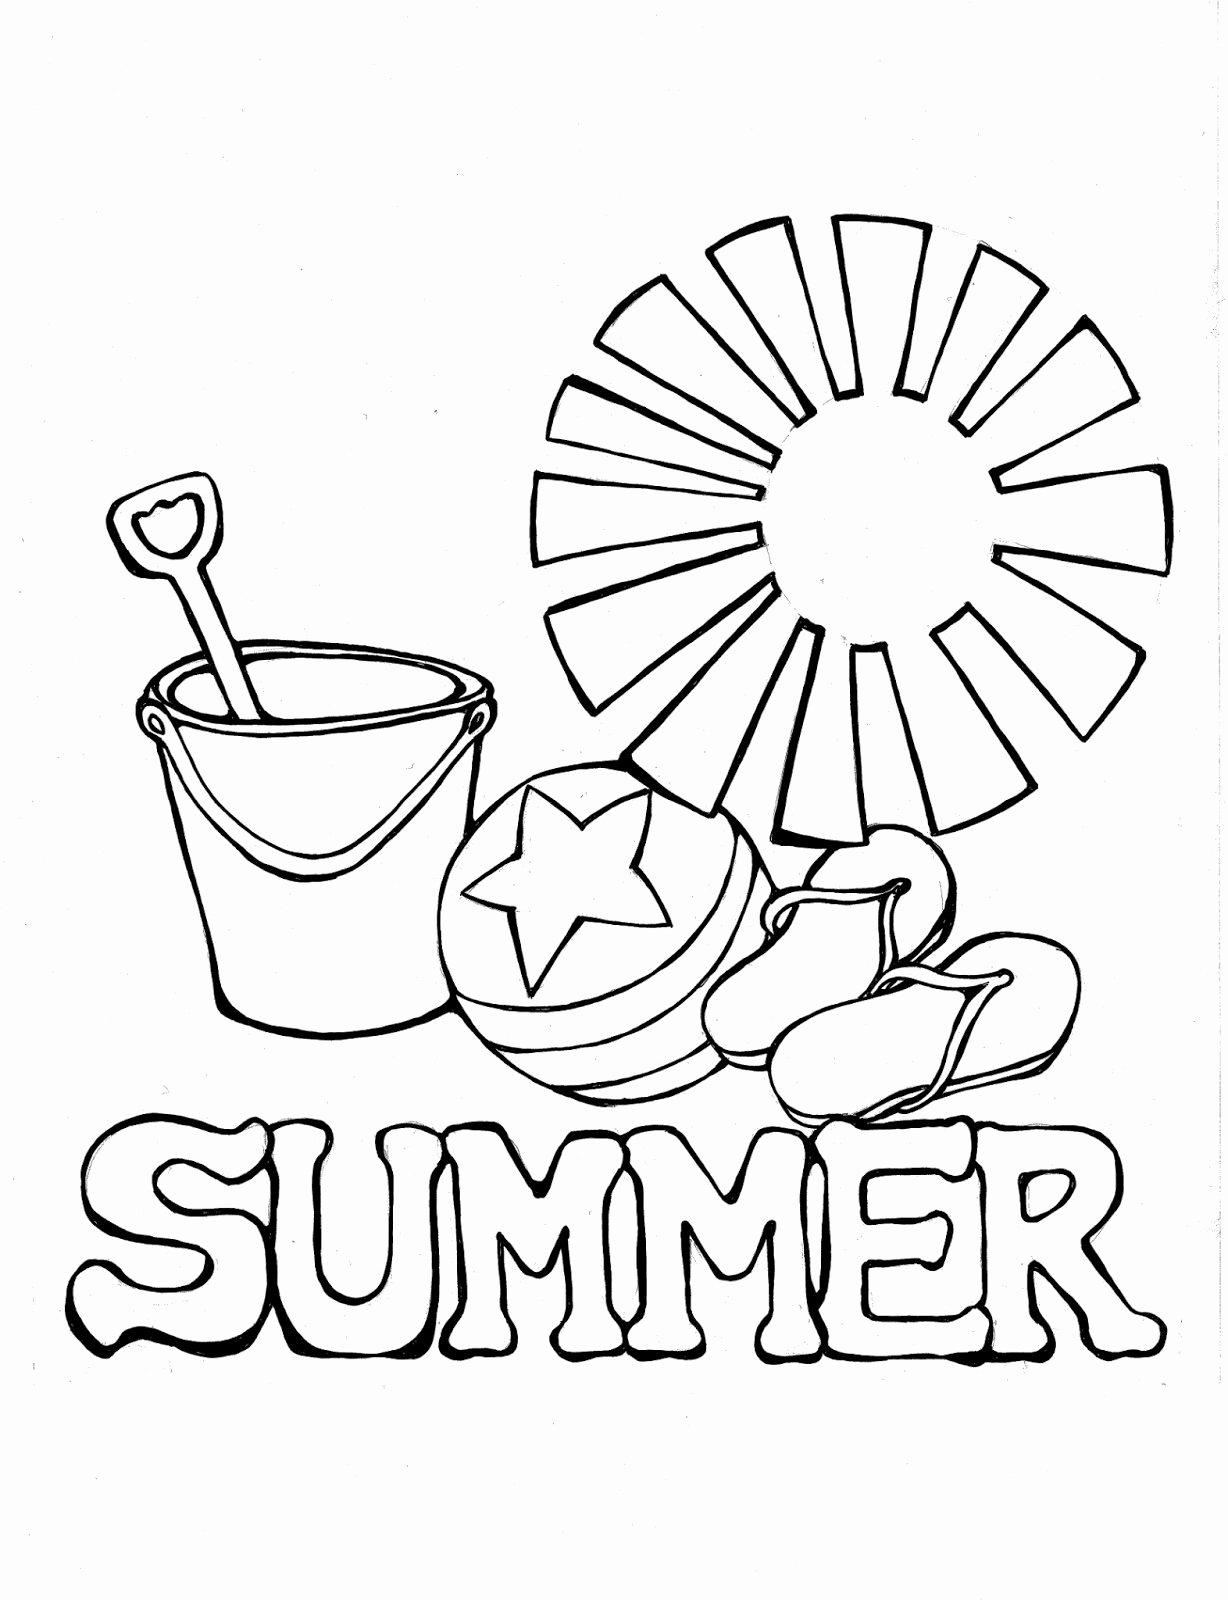 Coloring Worksheets for Preschoolers Best Of Coloring Book Worksheet Preschool Pages Summer Worksheets